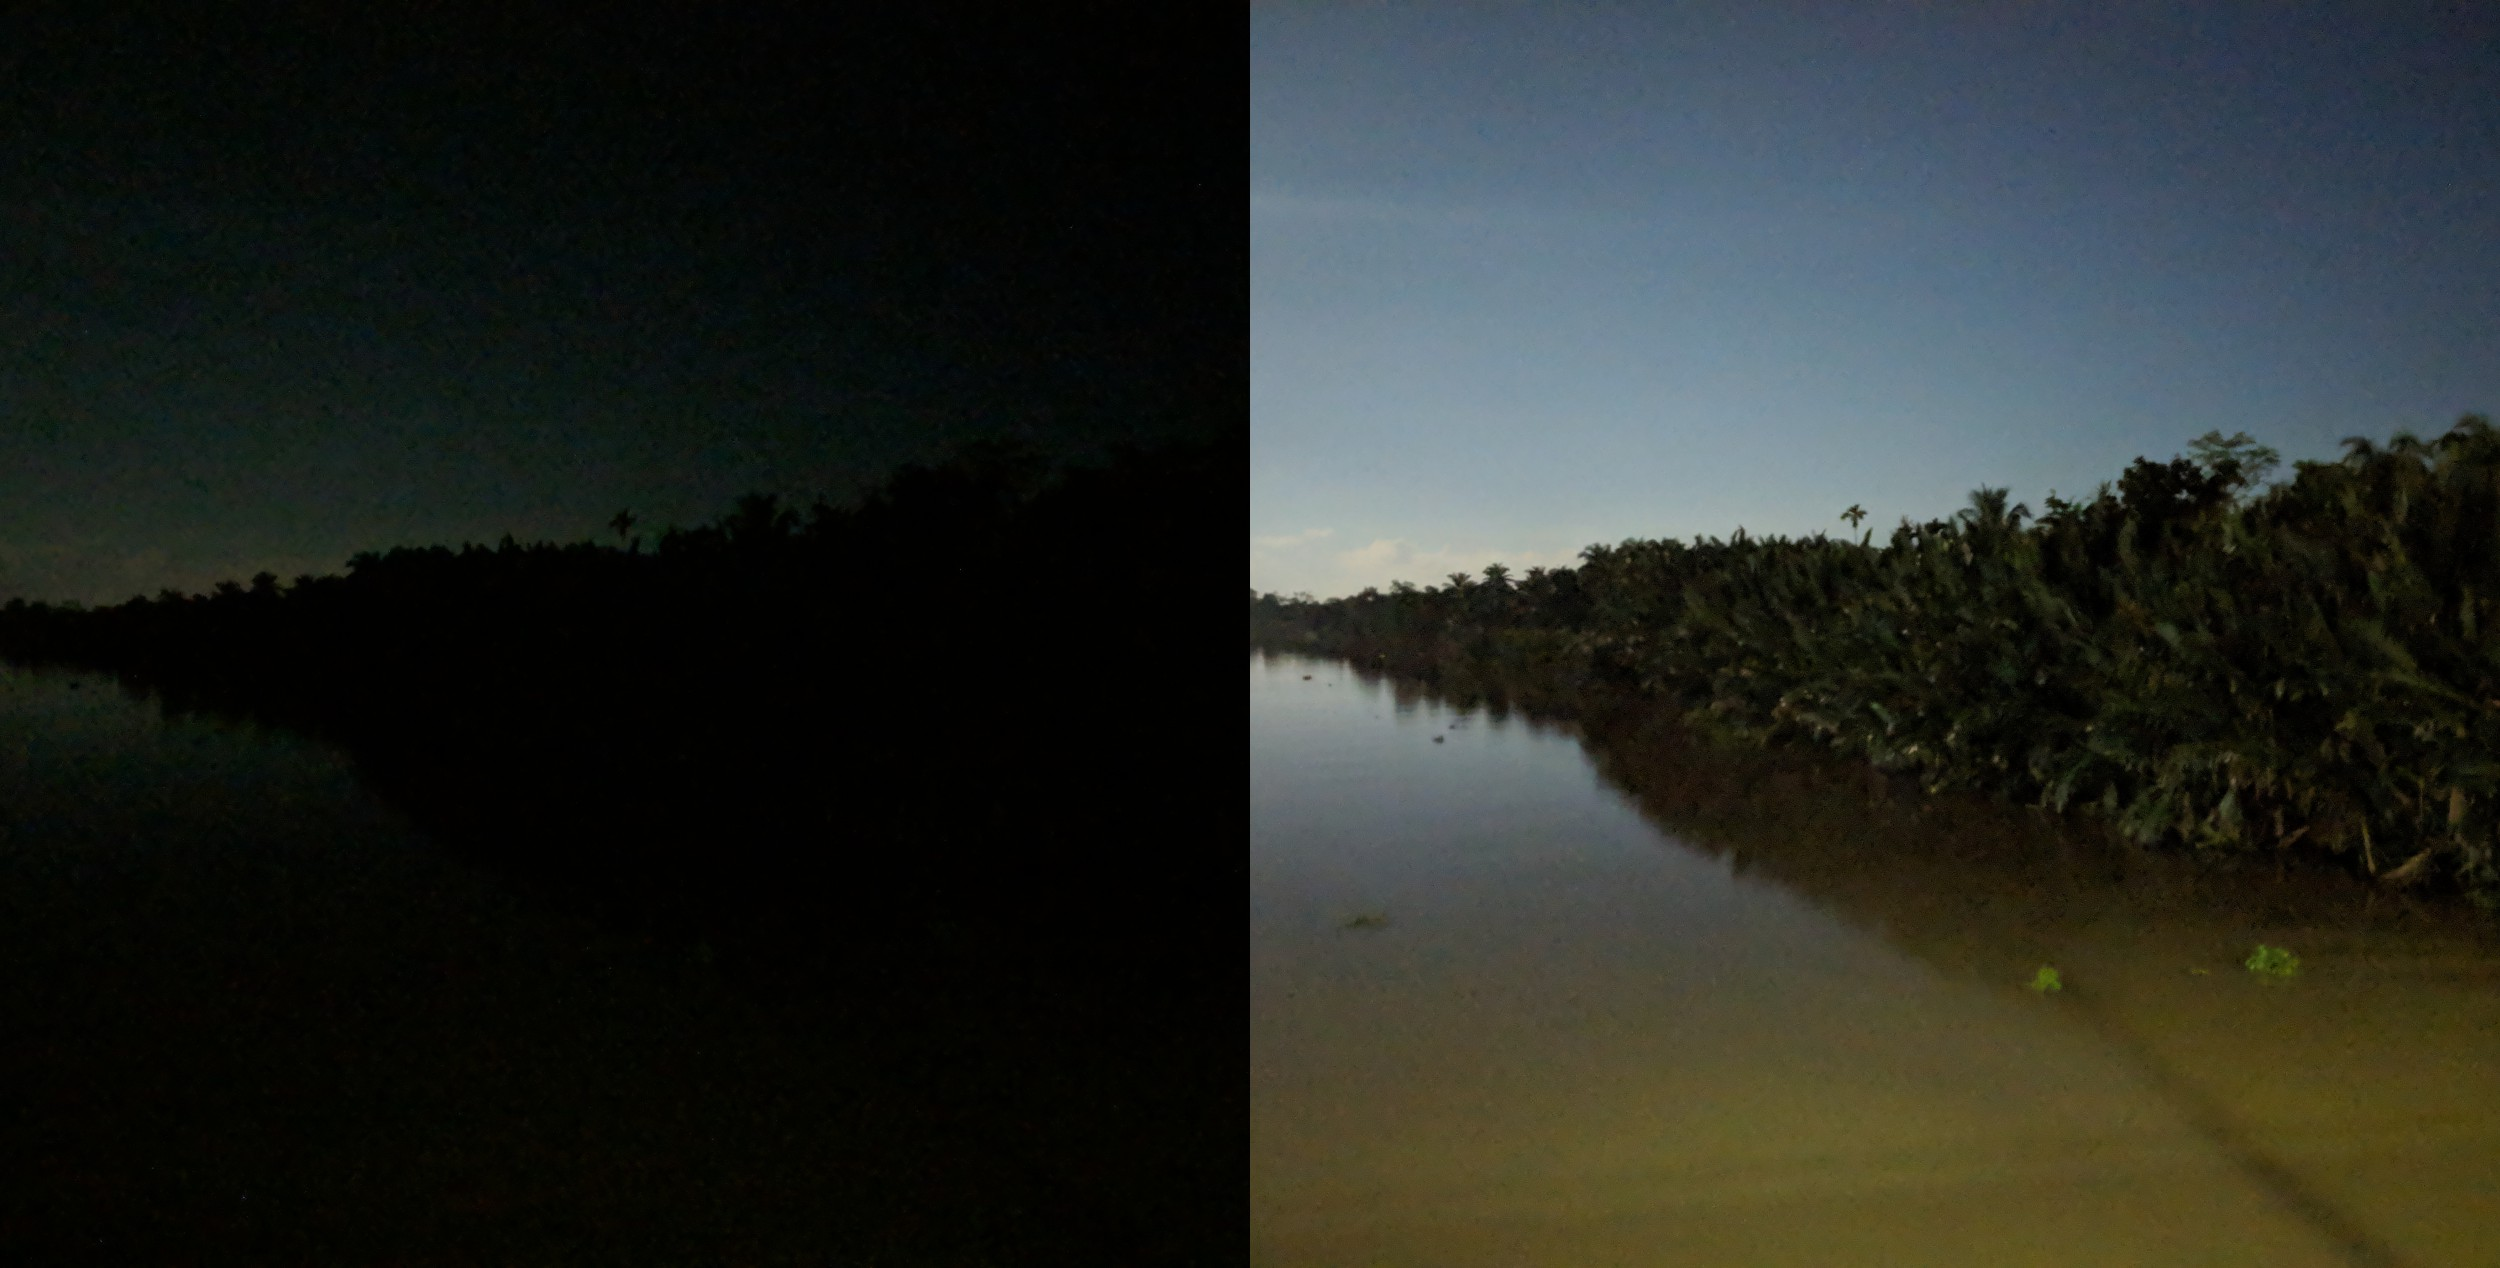 Google_Night_Sight_vs_Auto_on_Pixel2xl2.jpg